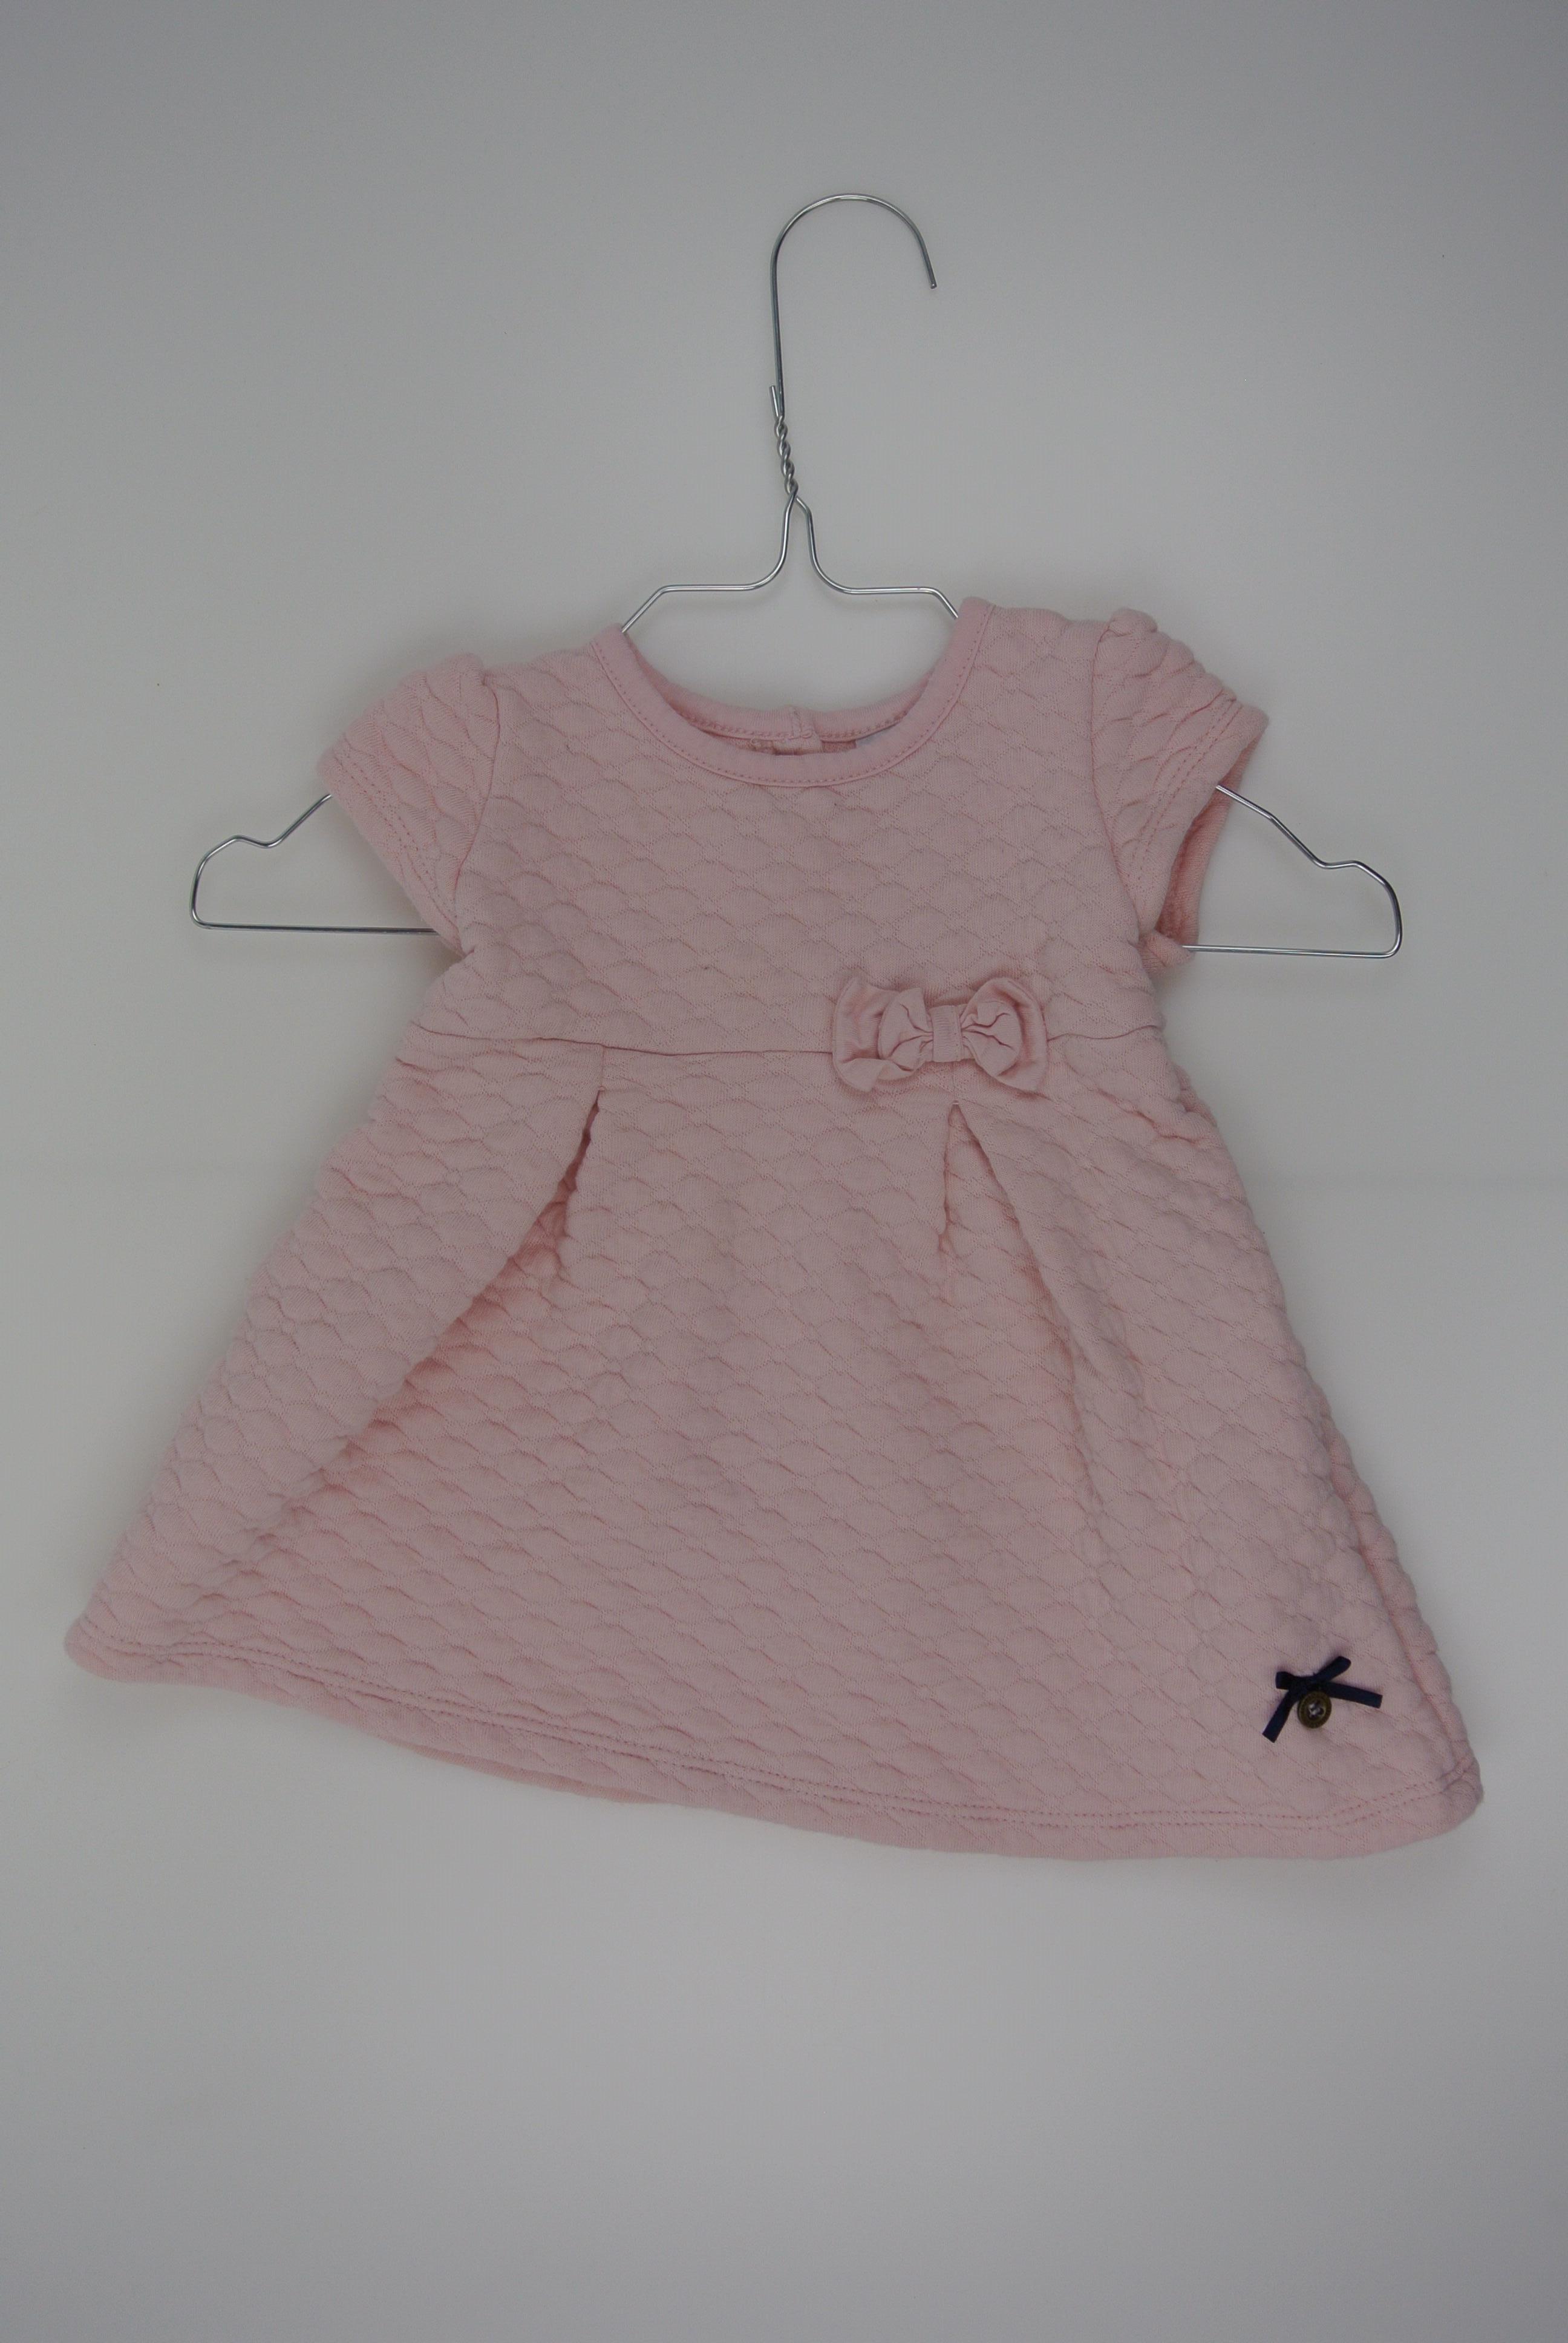 Jasper Conrad kjole str 62 pige 3-6